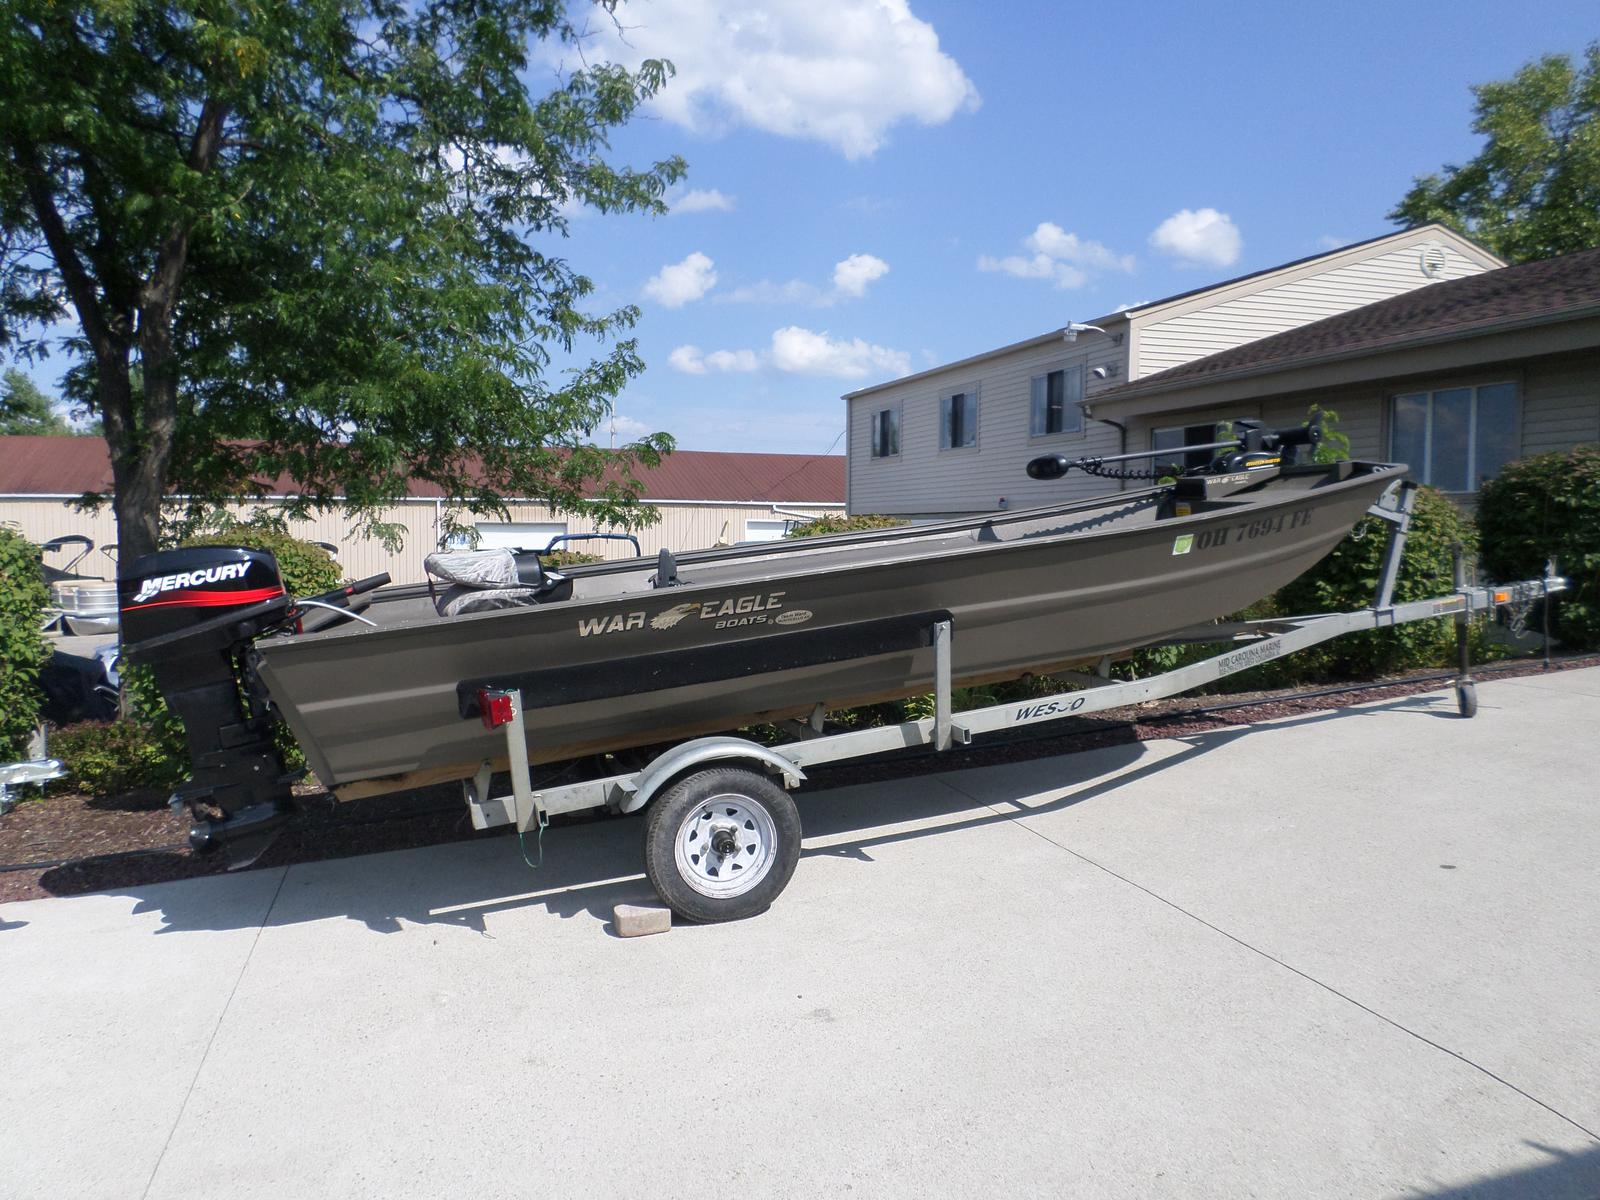 War Eagle Fishing Boat 542 FLD